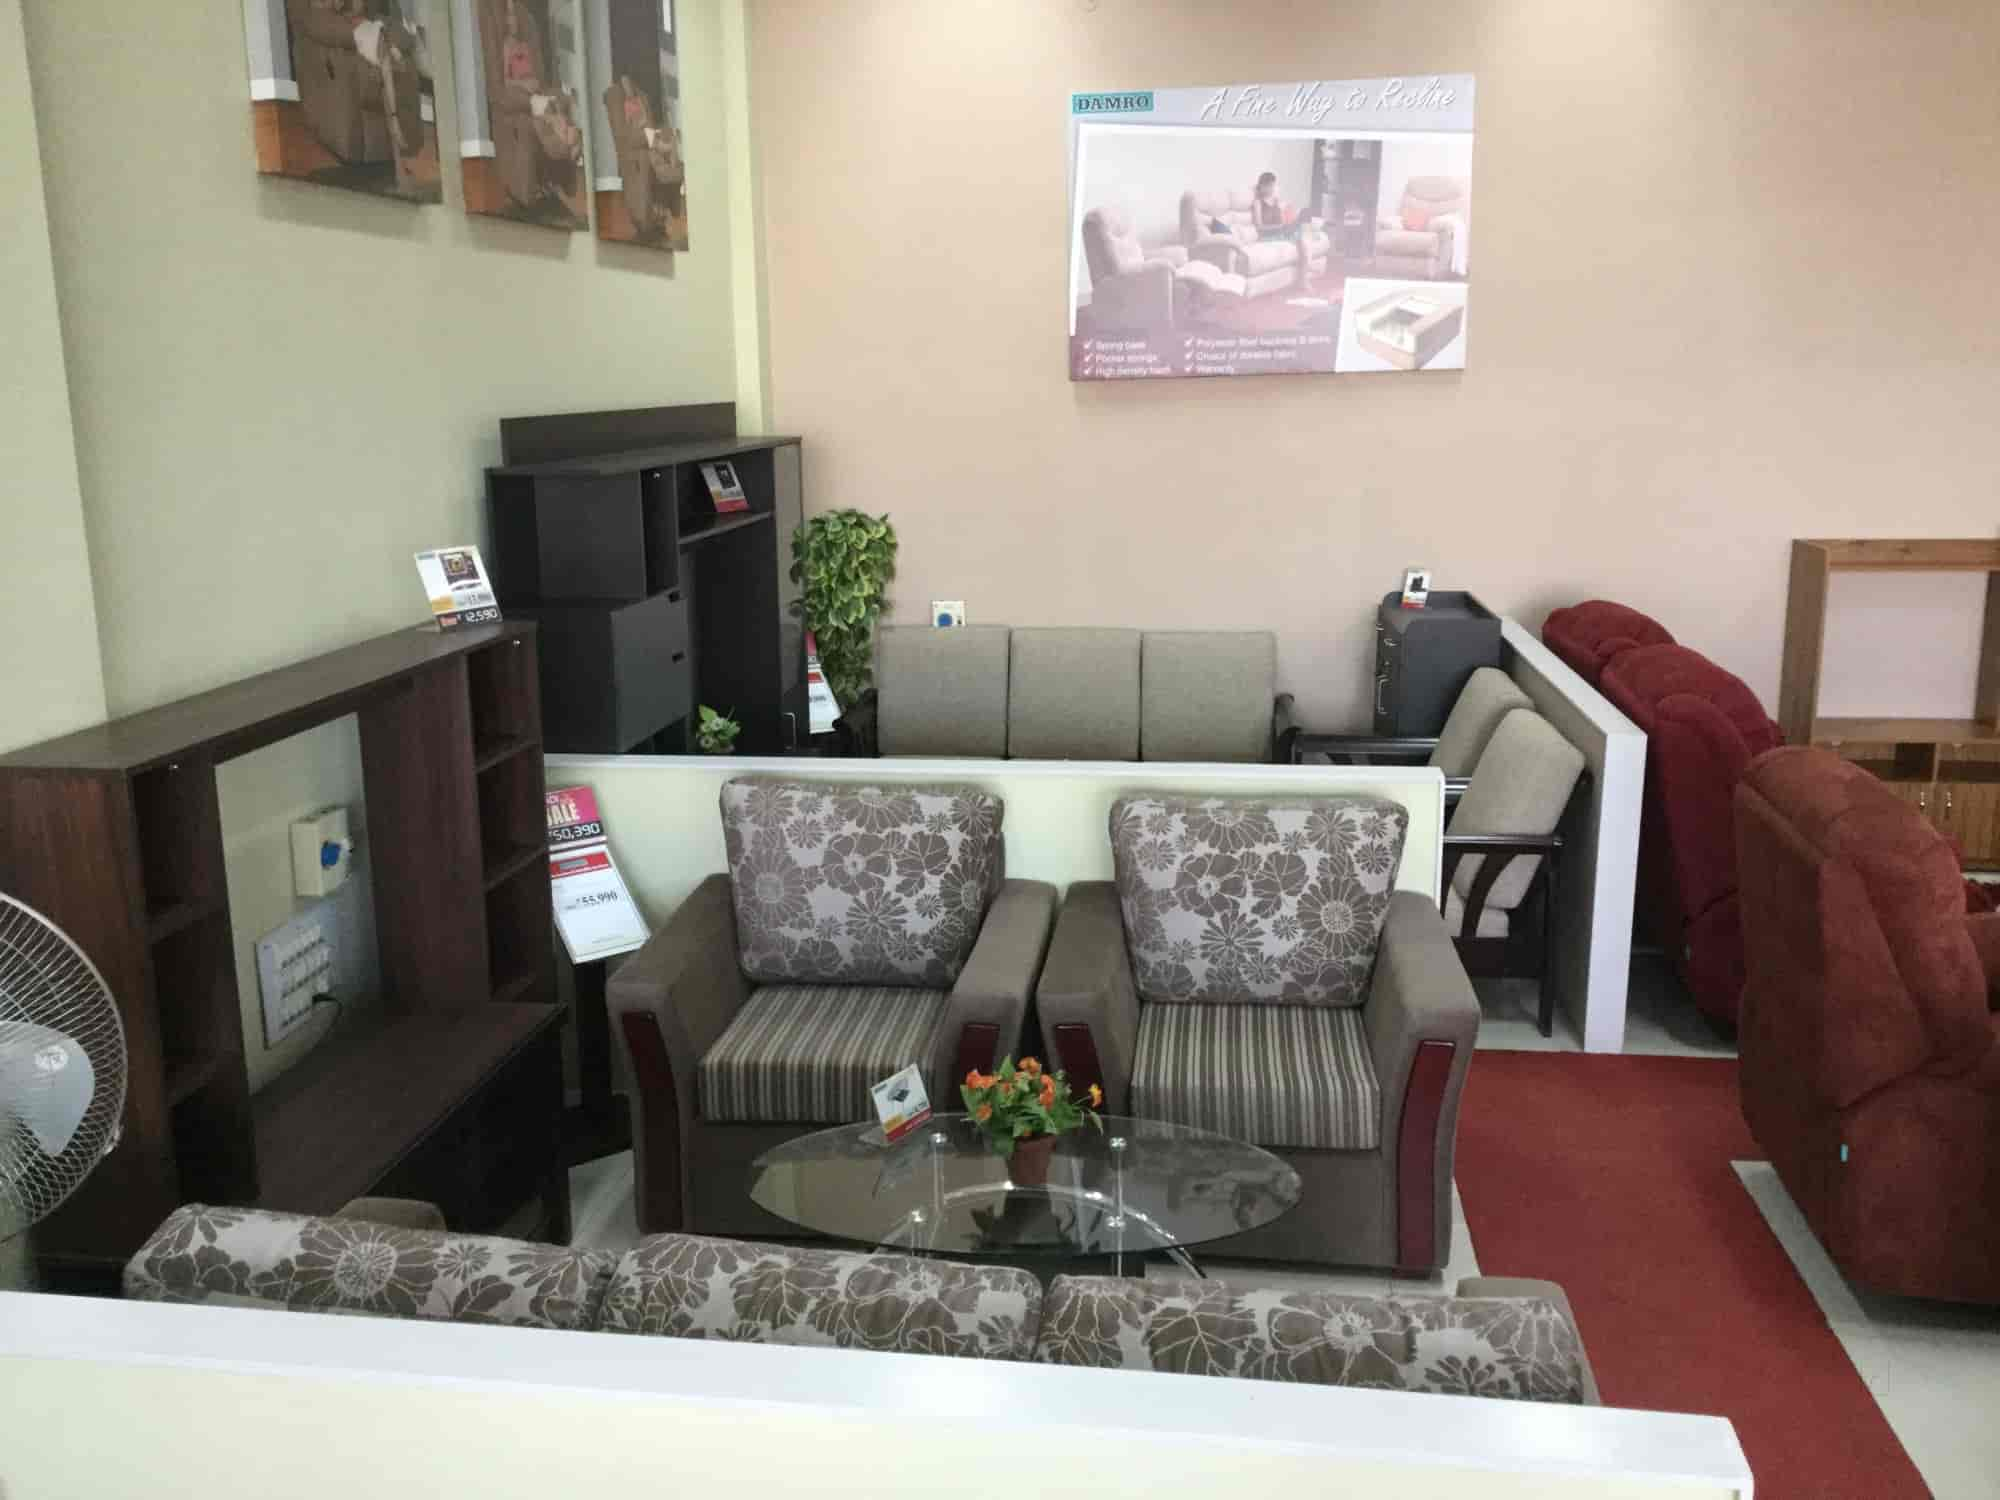 Damro Furniture Decor damro furniture pvt ltd, porur - mattress dealers in chennai